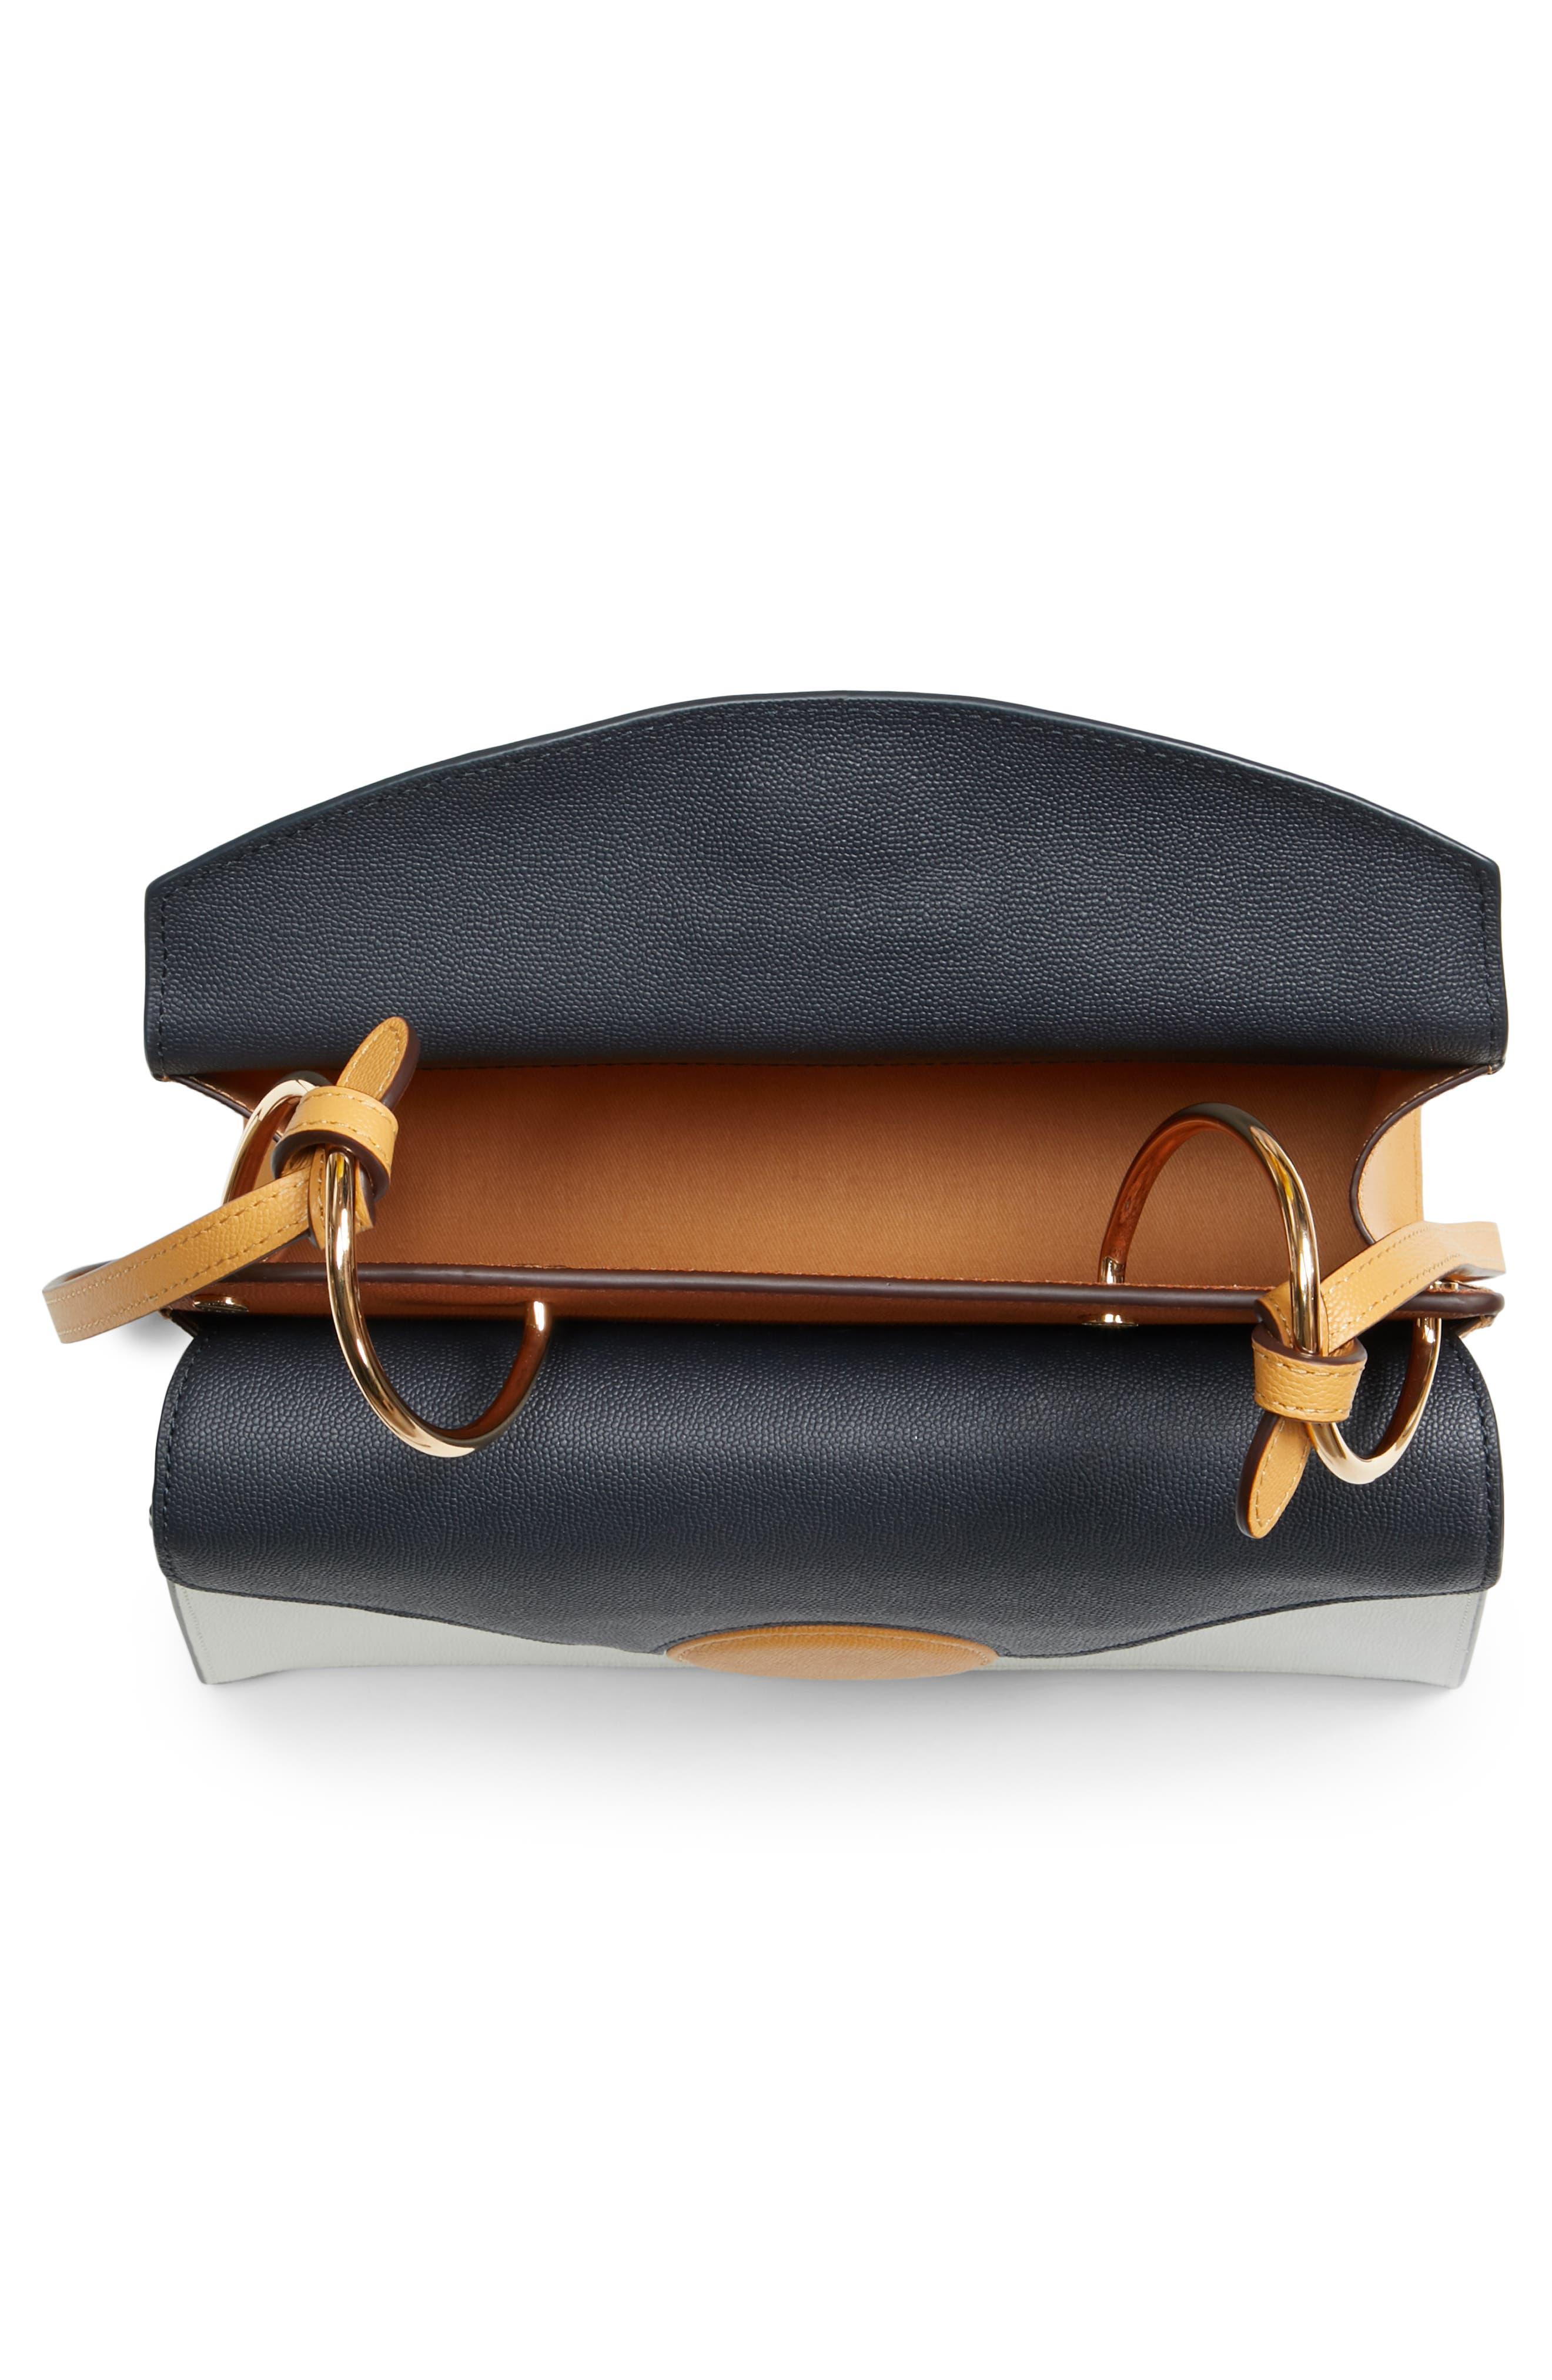 Phoebe Leather Crossbody Bag,                             Alternate thumbnail 4, color,                             MARINE/ SAND